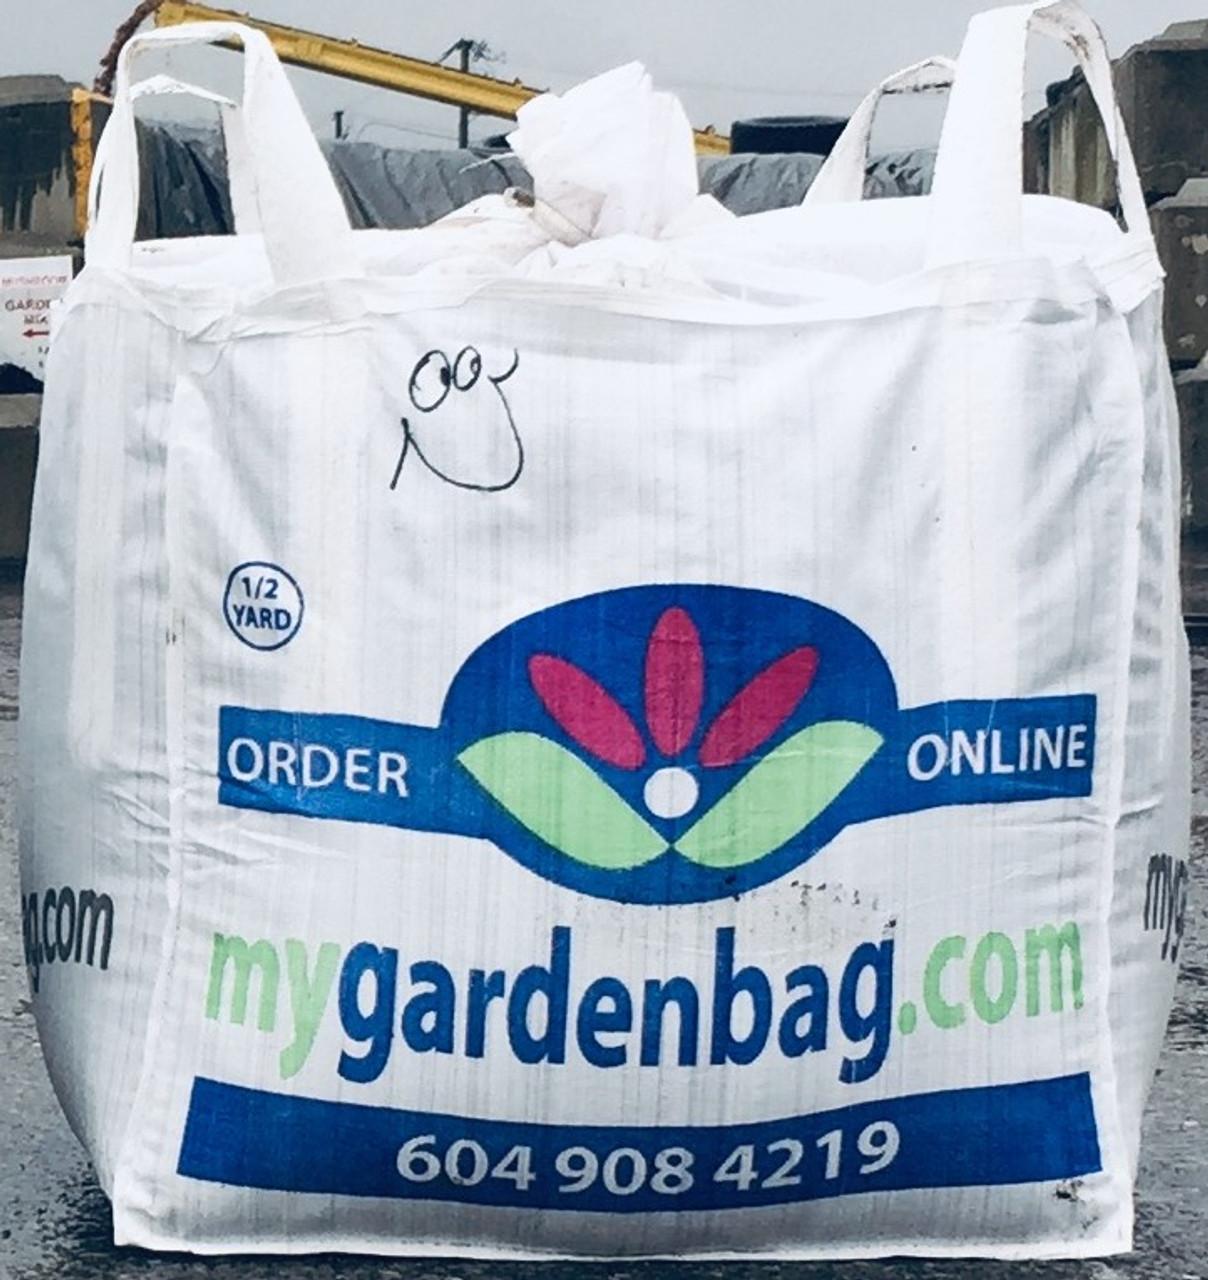 1/2 yard bag of River Sand